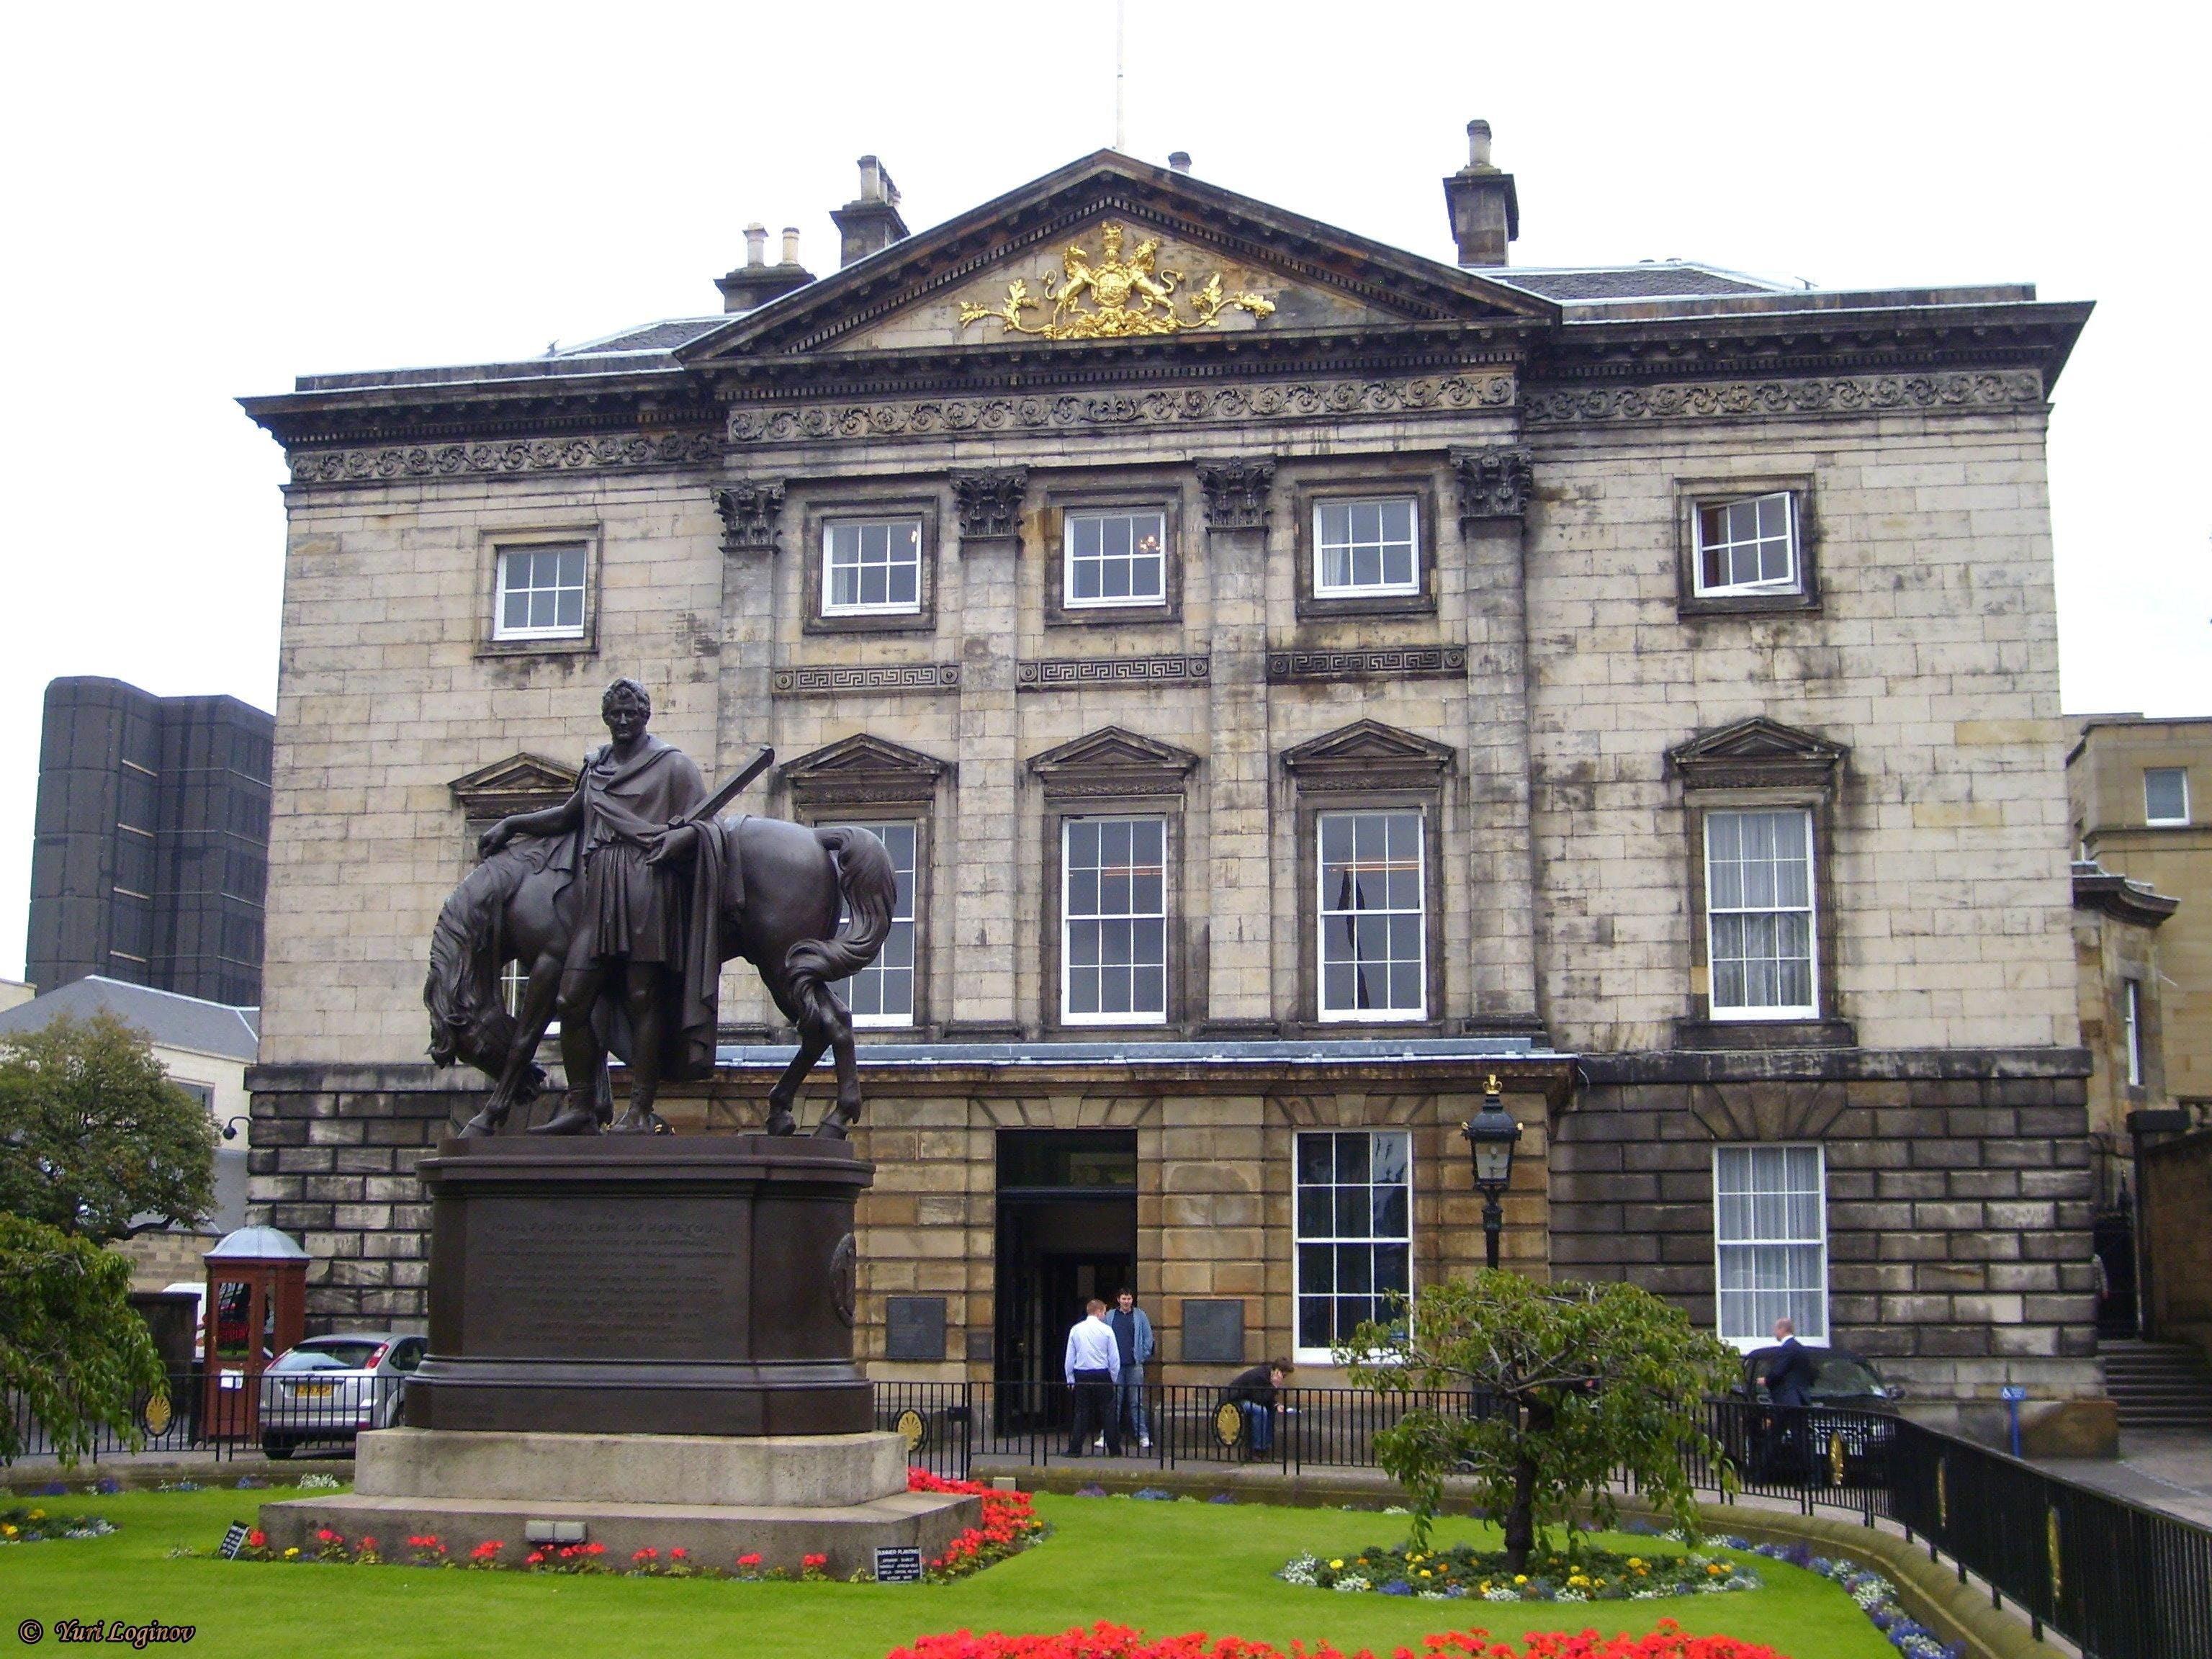 Free stock photo of scotland, edinburgh, united kingdom, Dundas House